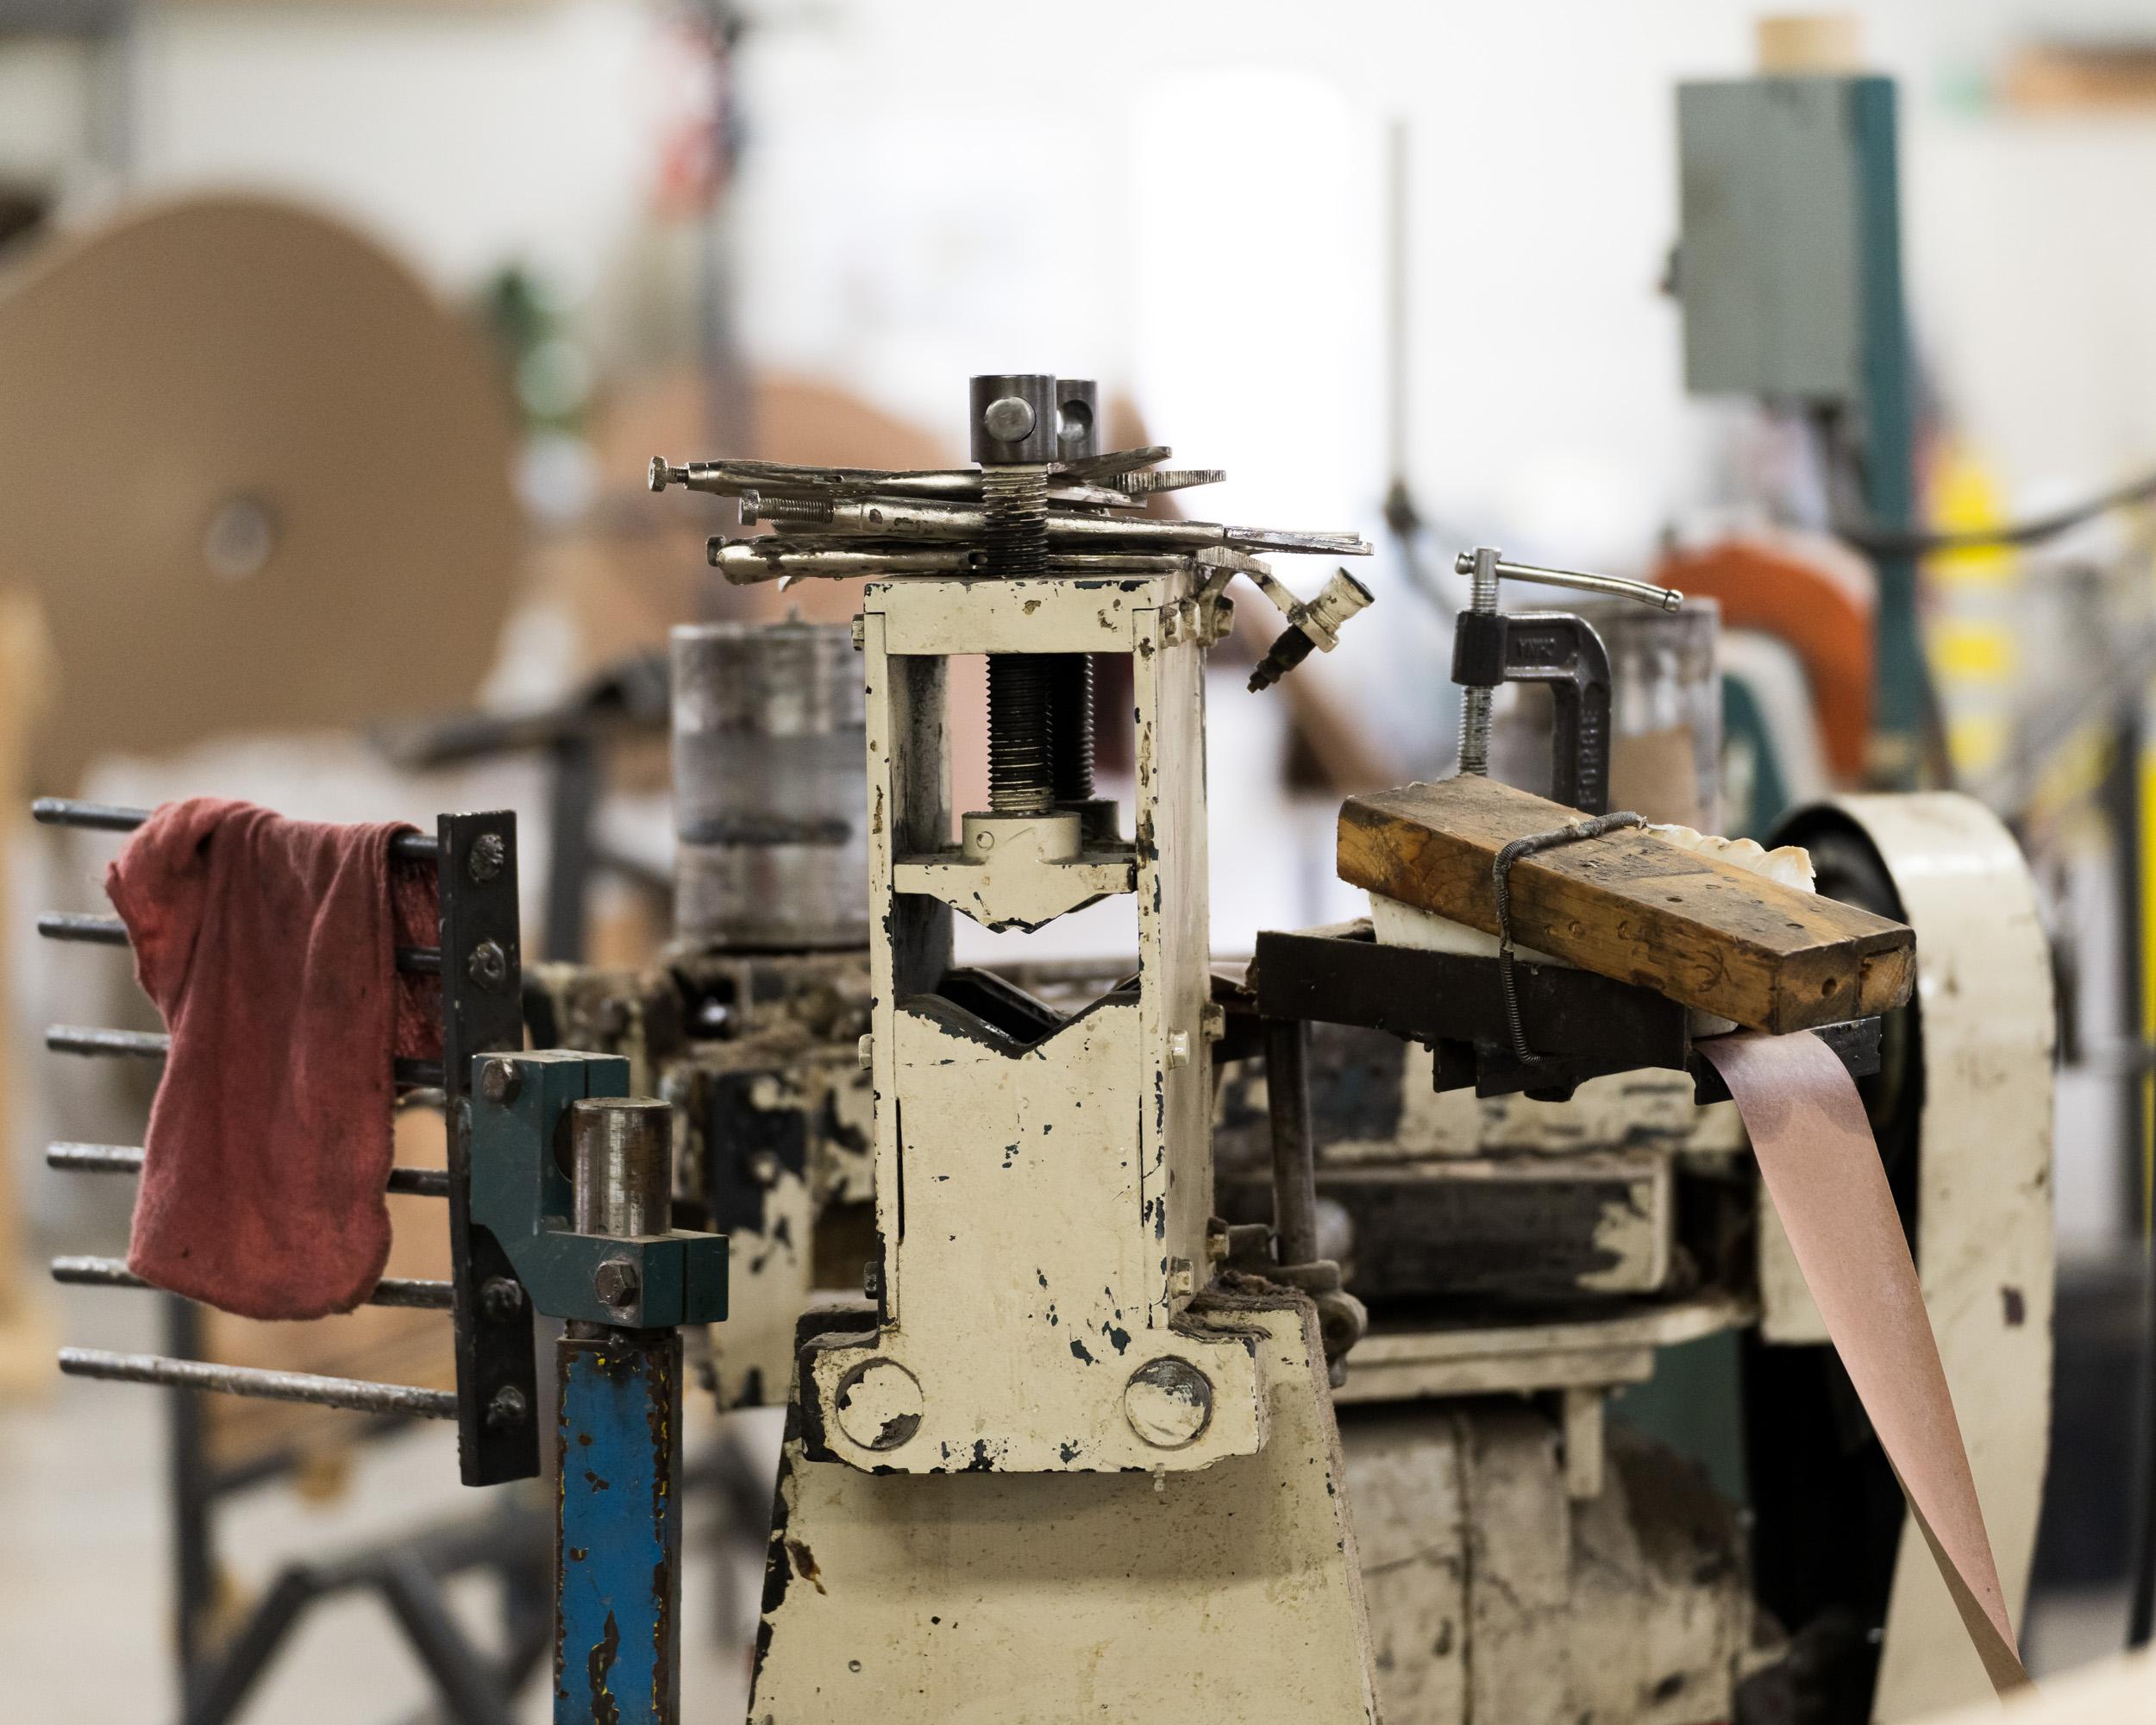 A complex machine inside a warehouse